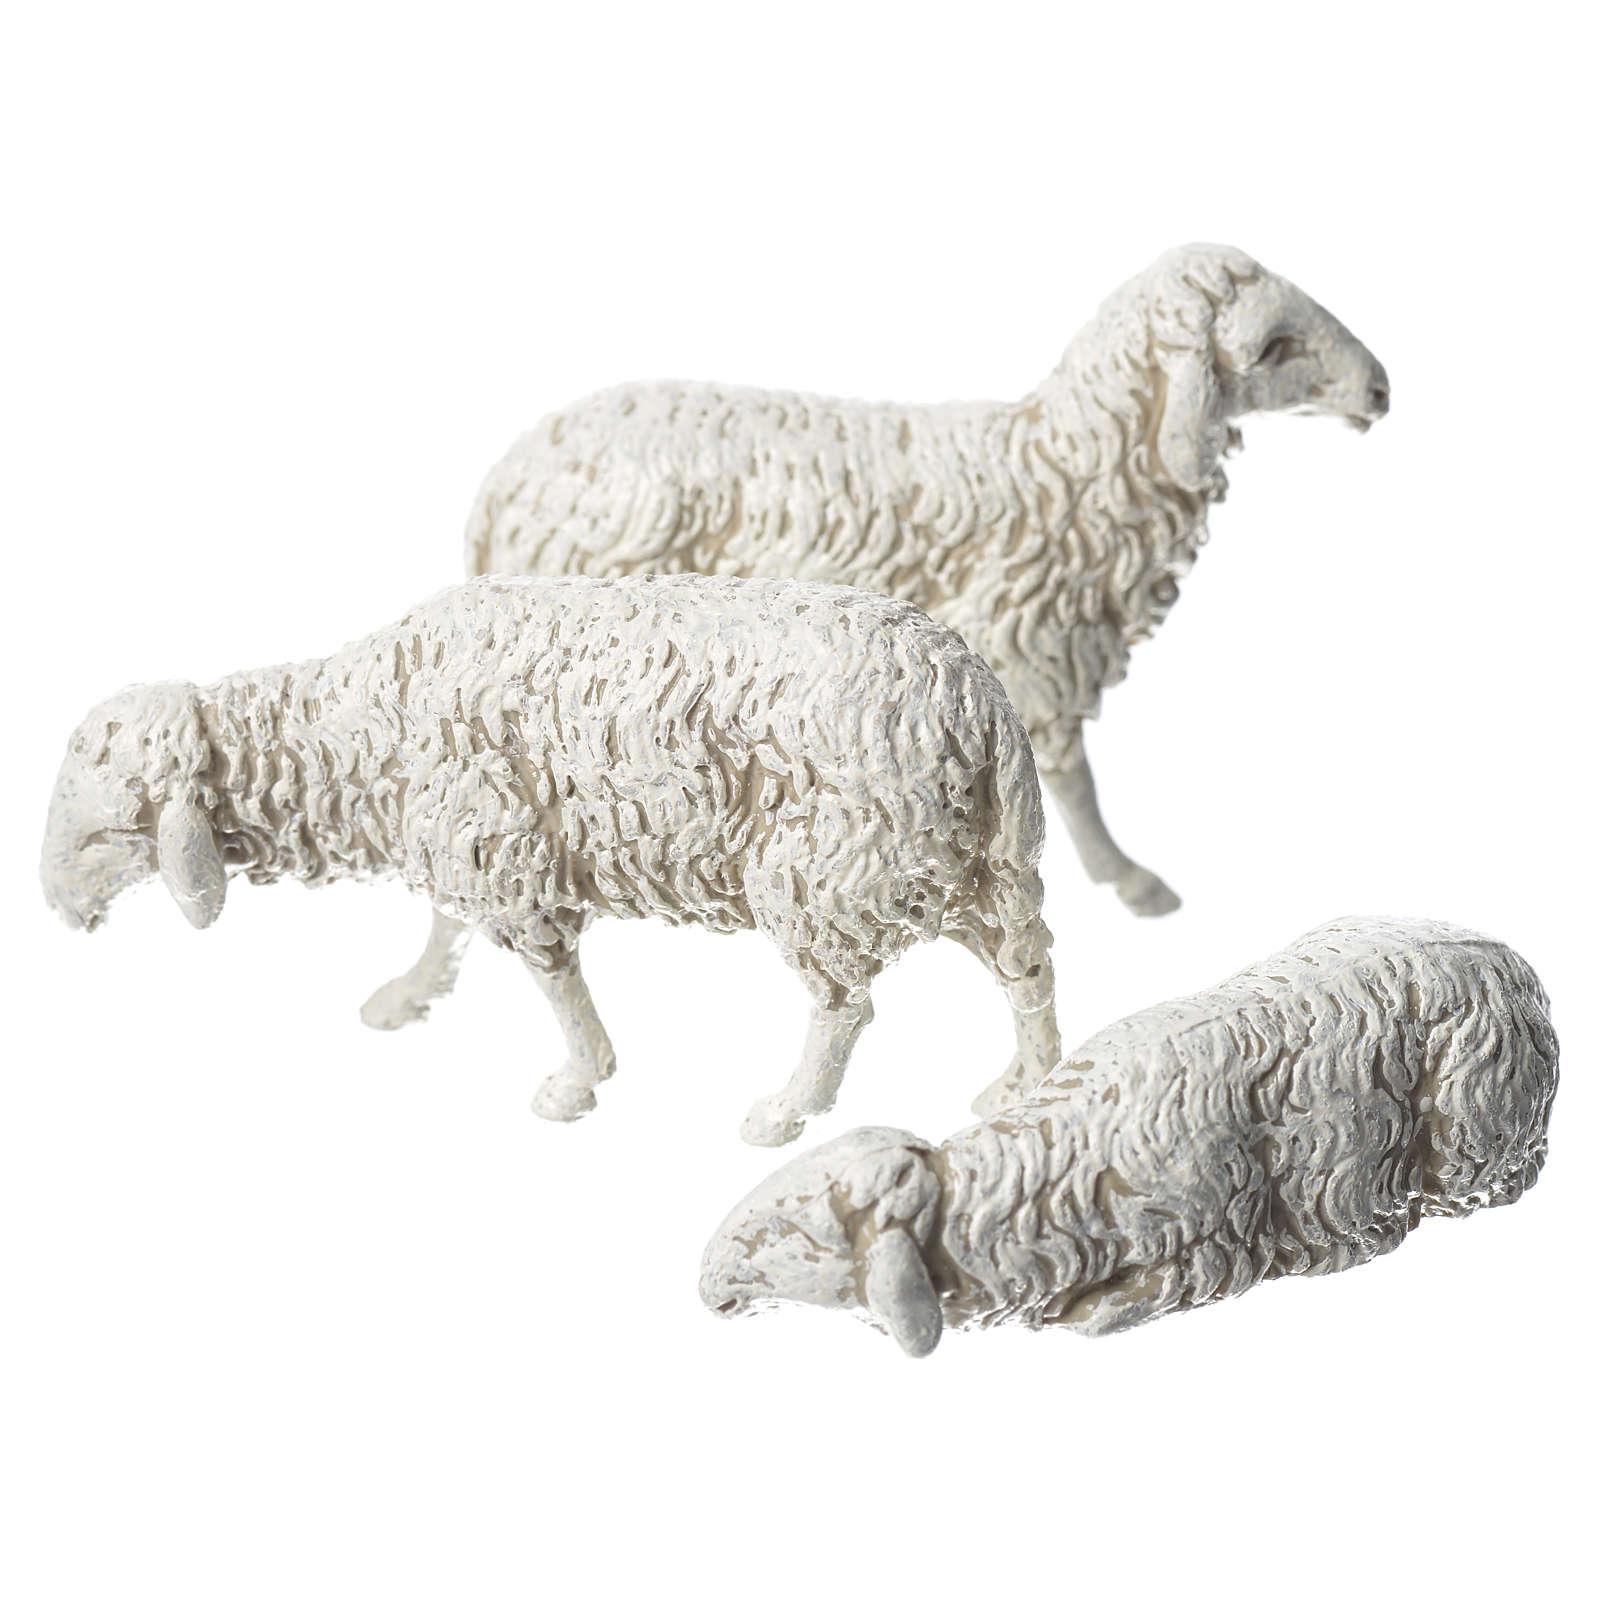 Moutons crèche Moranduzzo 10cm, 3 pcs 4